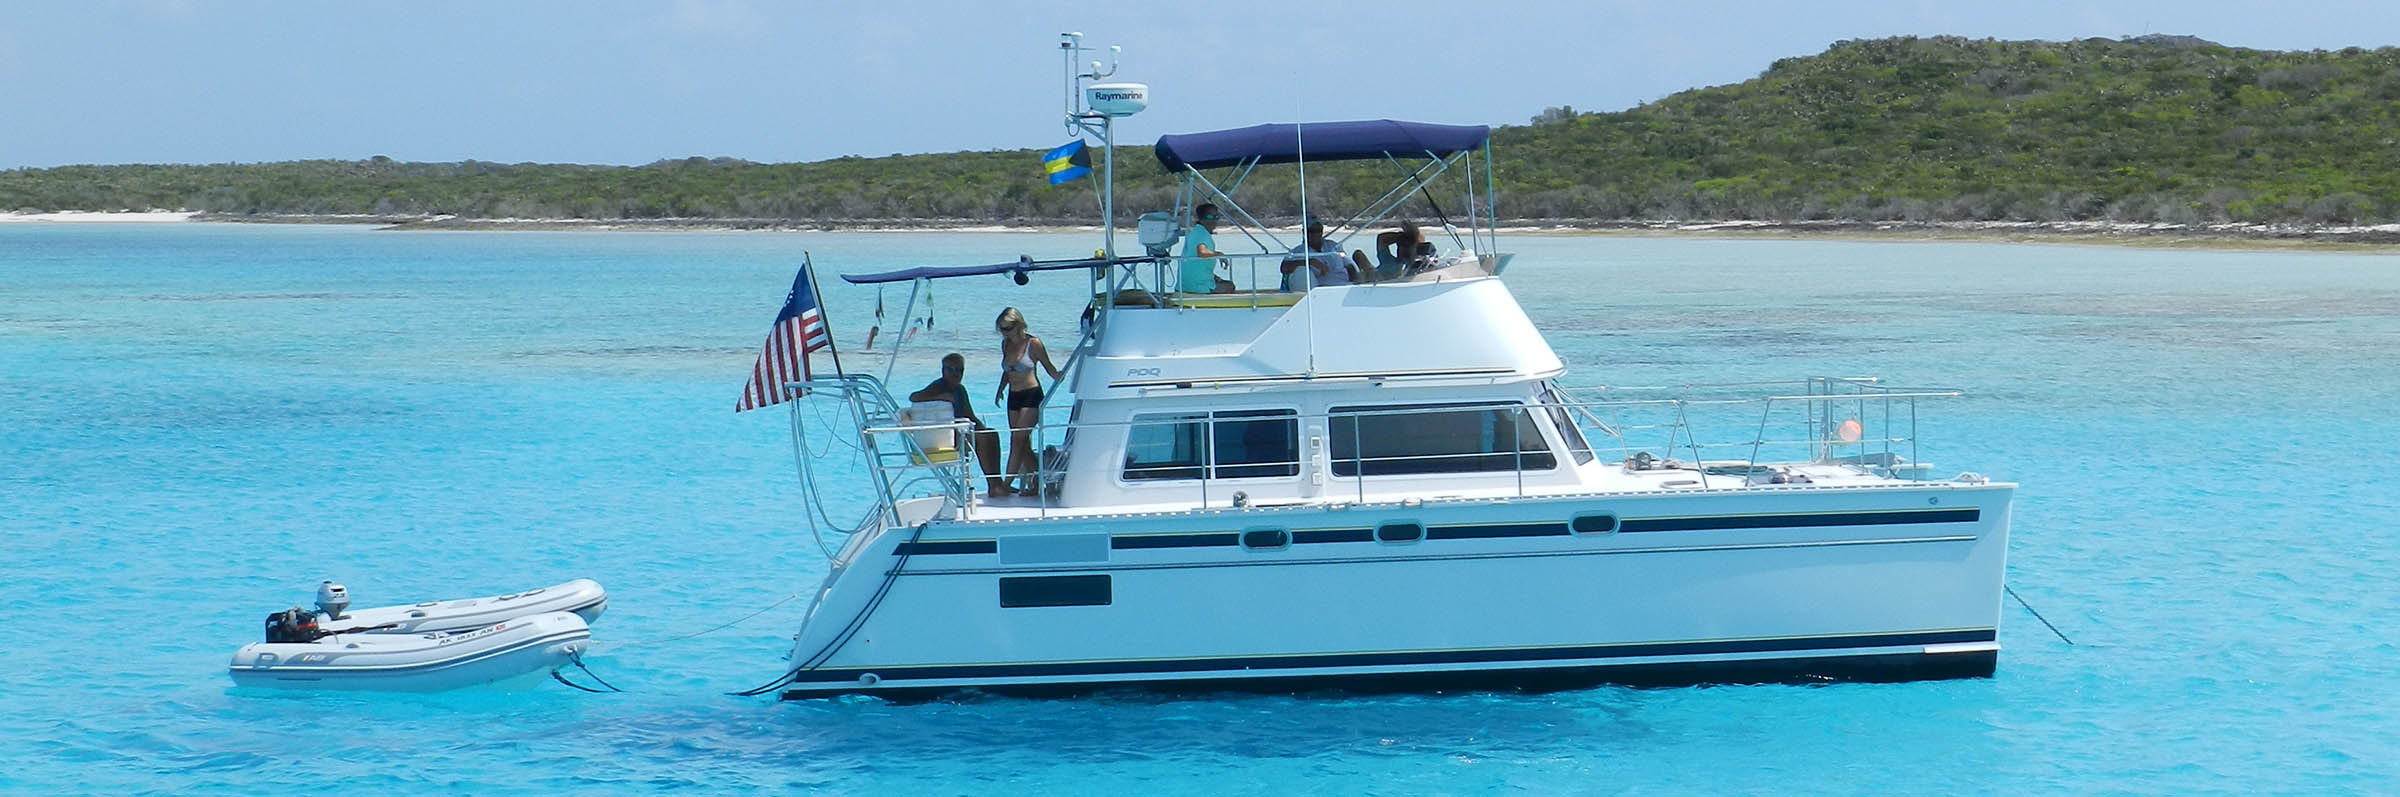 Rhumb Line Yacht Sales Rhumb Line Yacht Sales